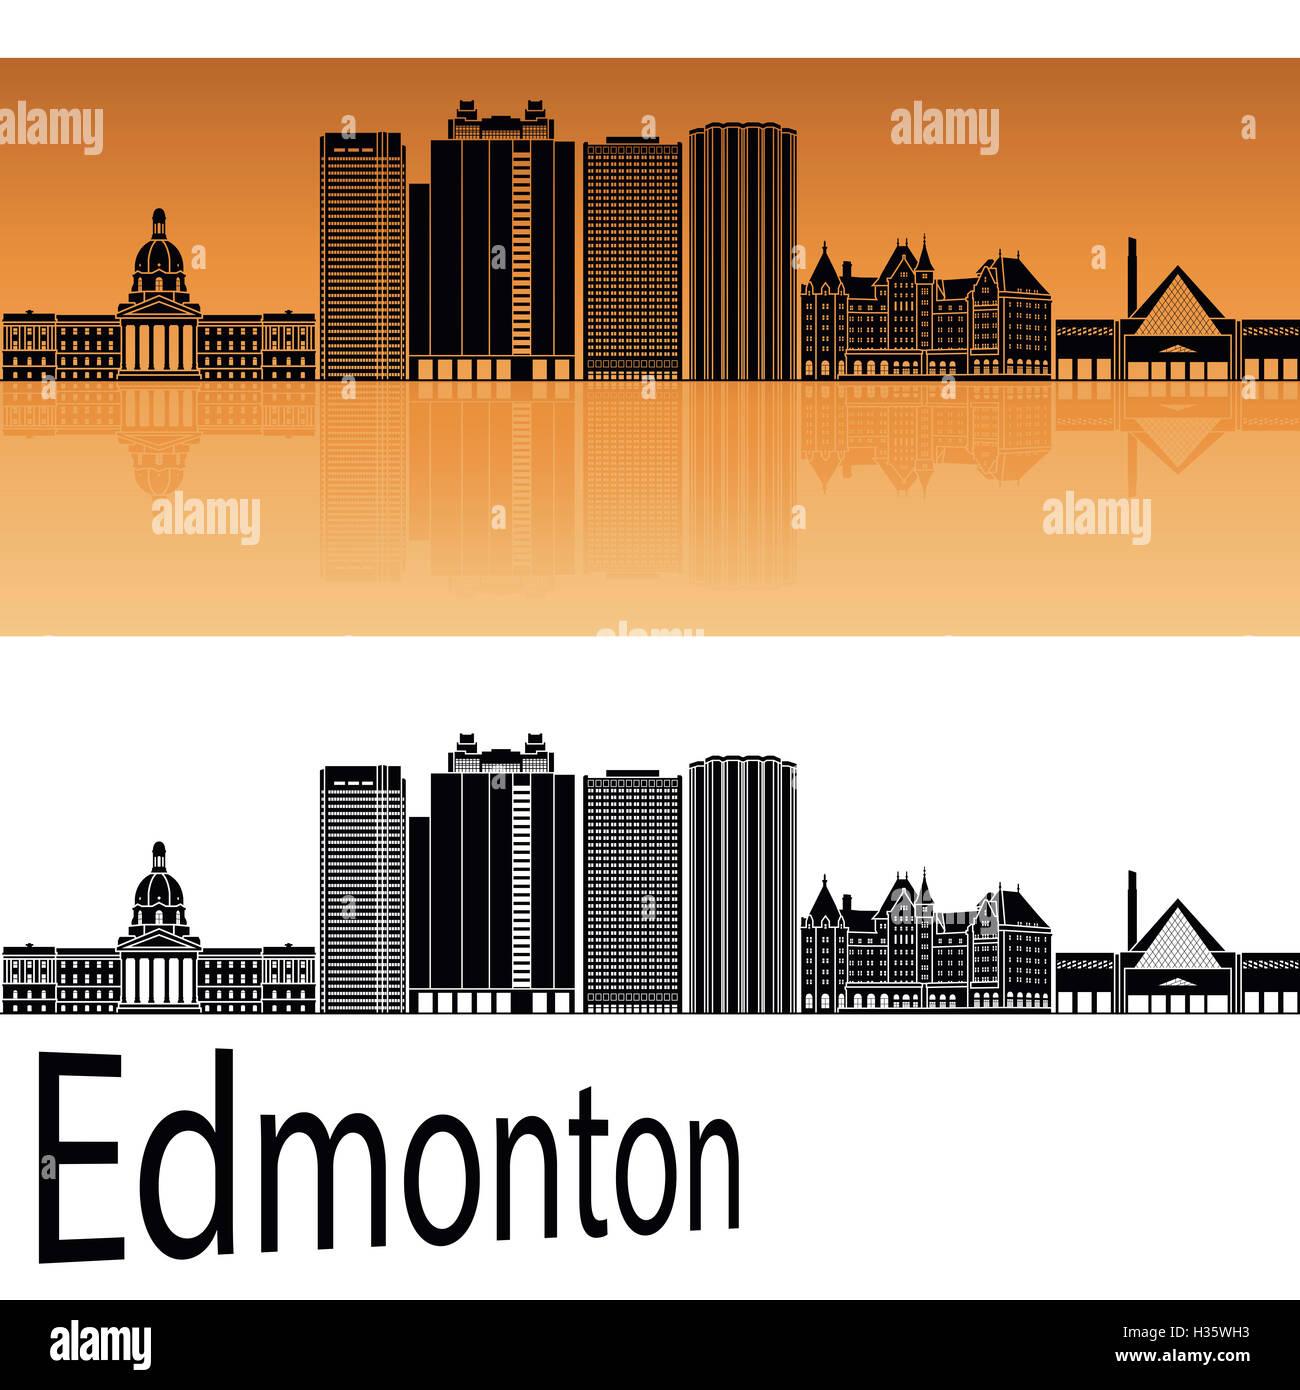 Edmonton V2 skyline in orange background in editable vector file - Stock Image